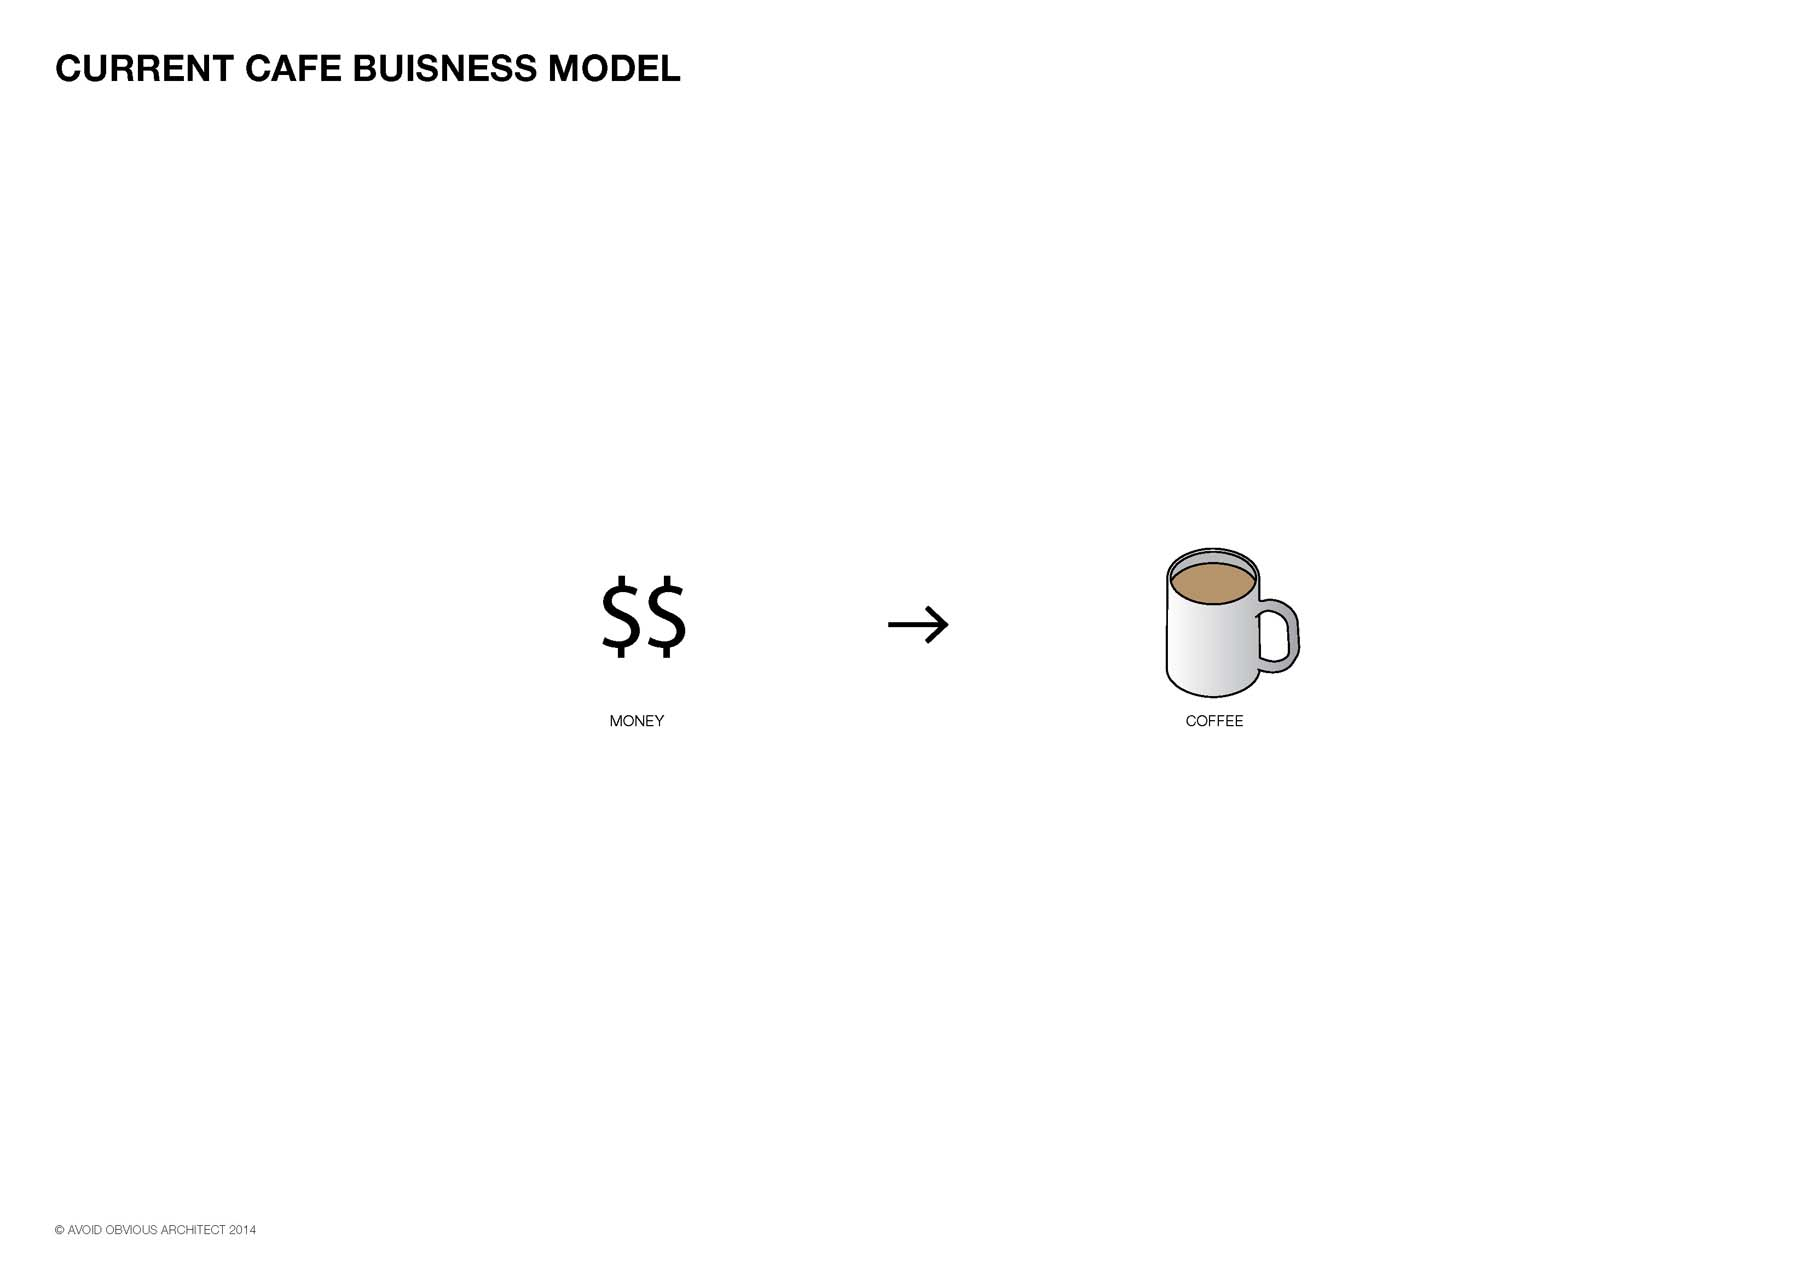 cafe, starbucks, shops, boutique, design, coffee, rental